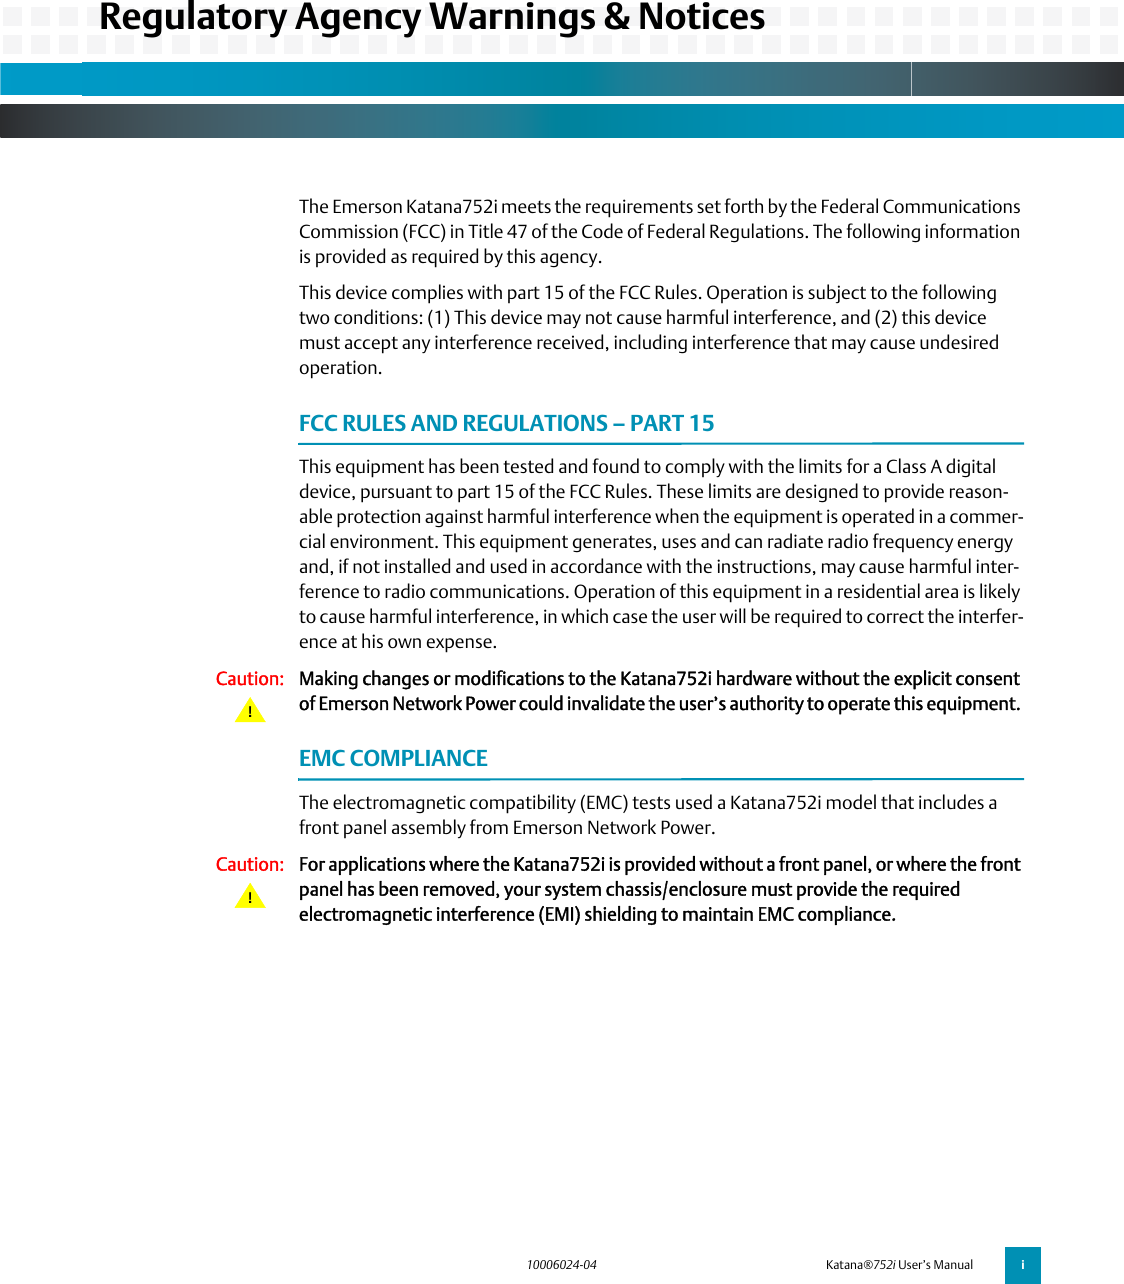 Emerson 752I Users Manual Katana752i User's Manual, #10006024 04